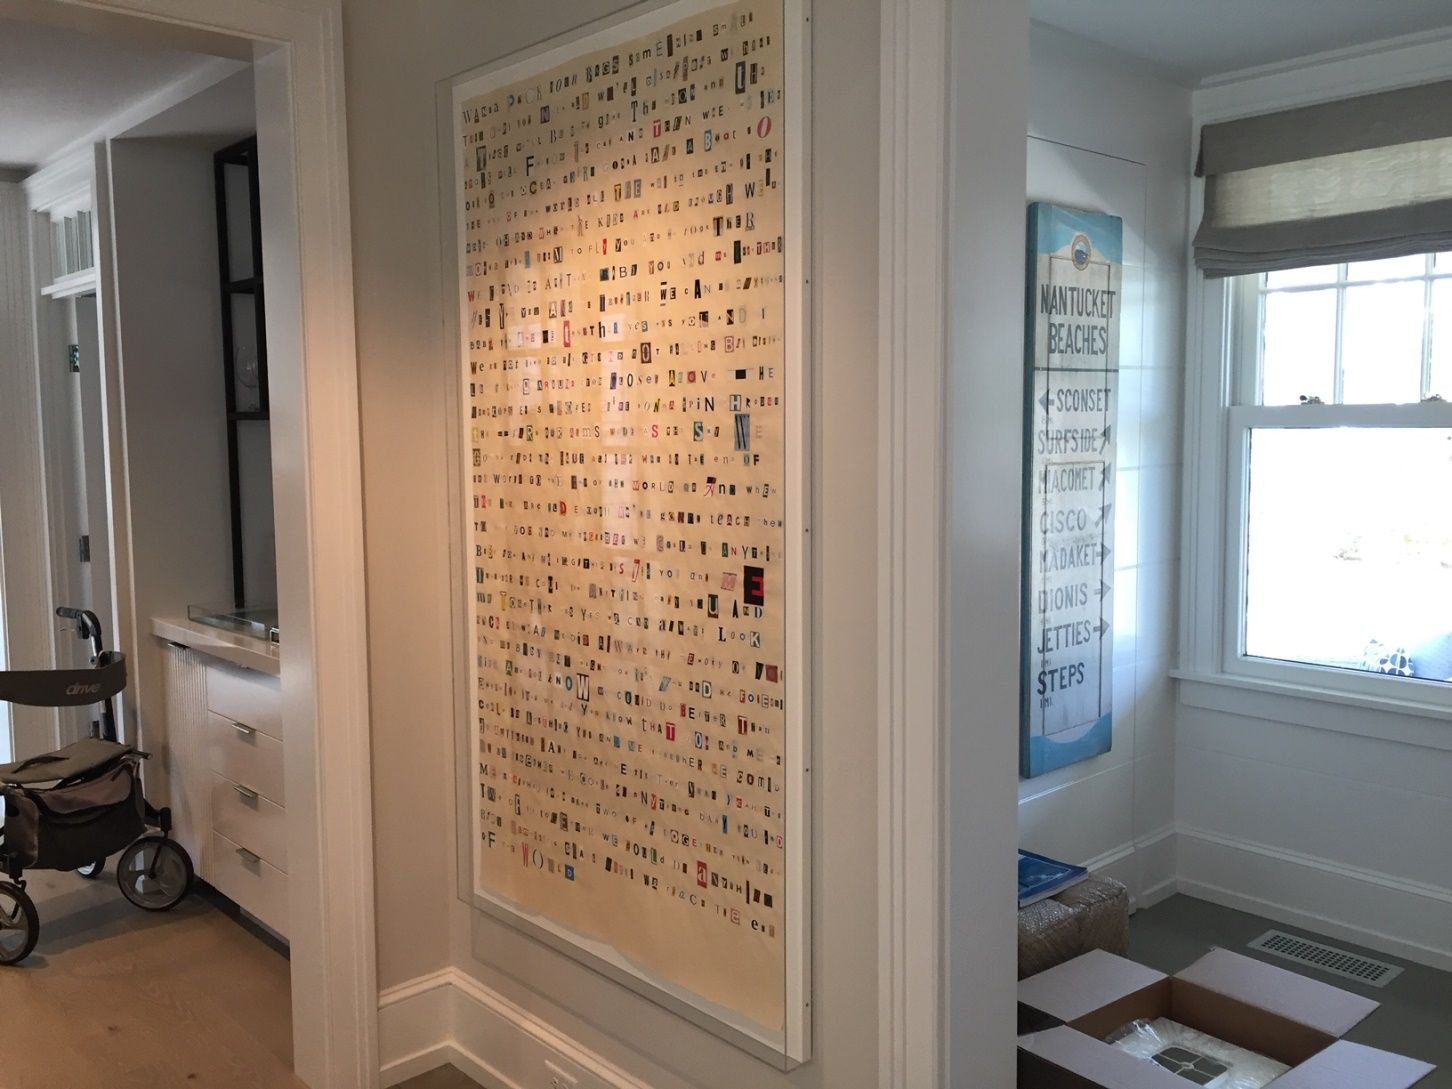 Moving Wall Art To The Amazing Island Of Nantucket Moving Walls Wall Wall Art